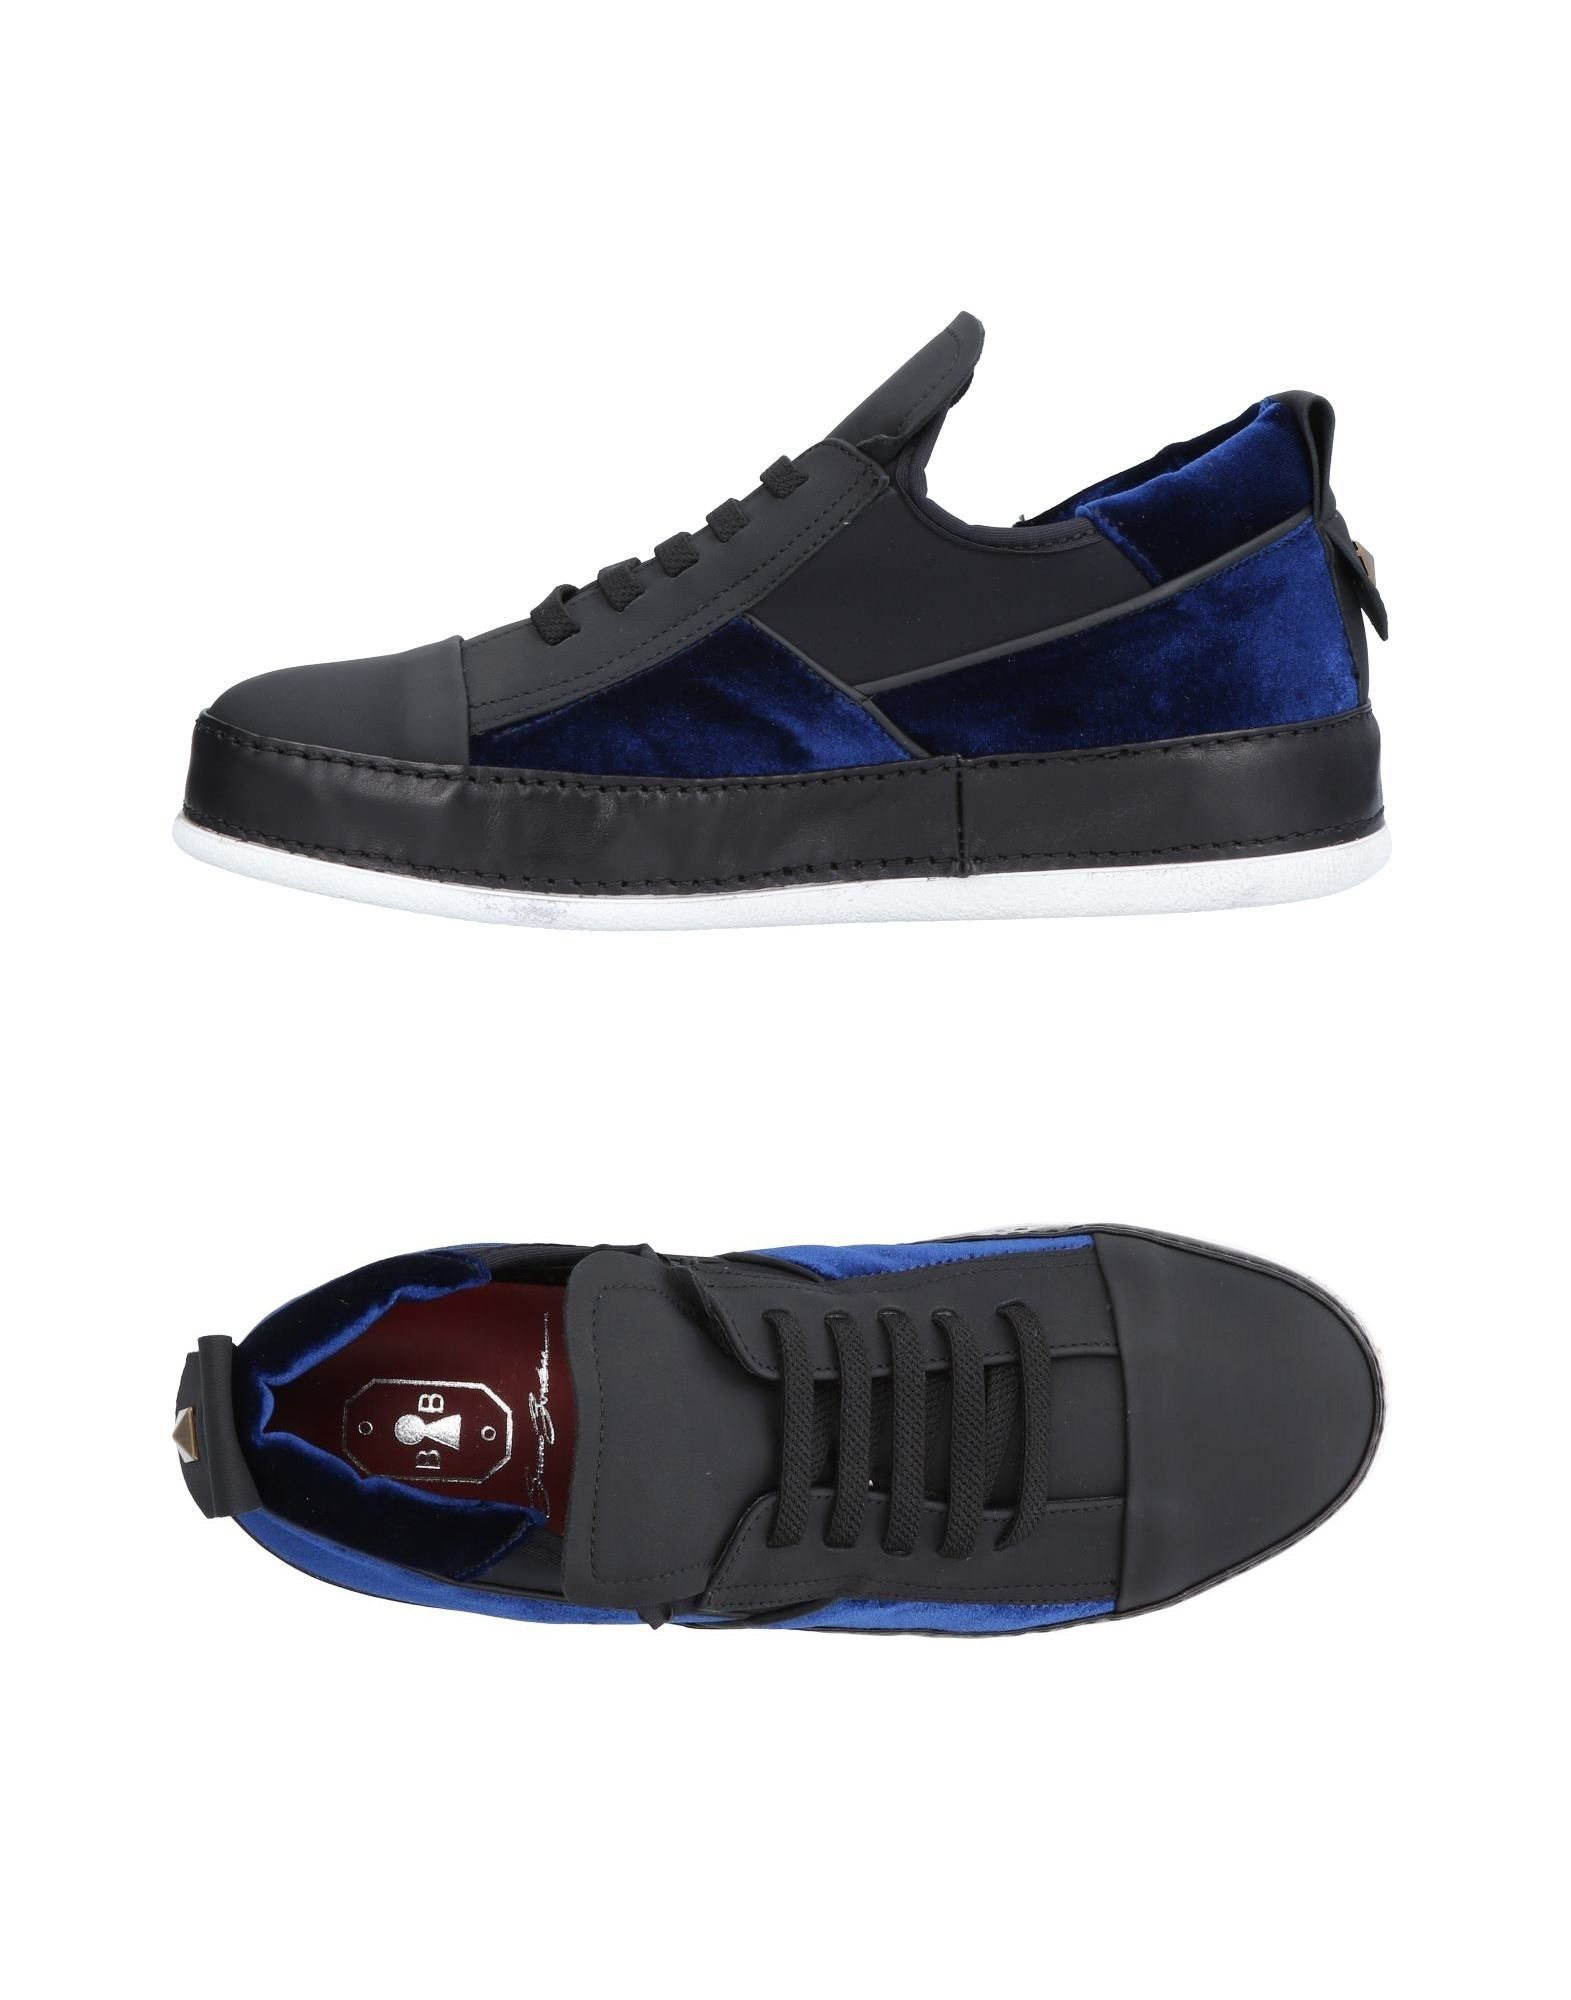 Bruno Bordese Sneakers Herren  11496735SE Gute Qualität beliebte Schuhe